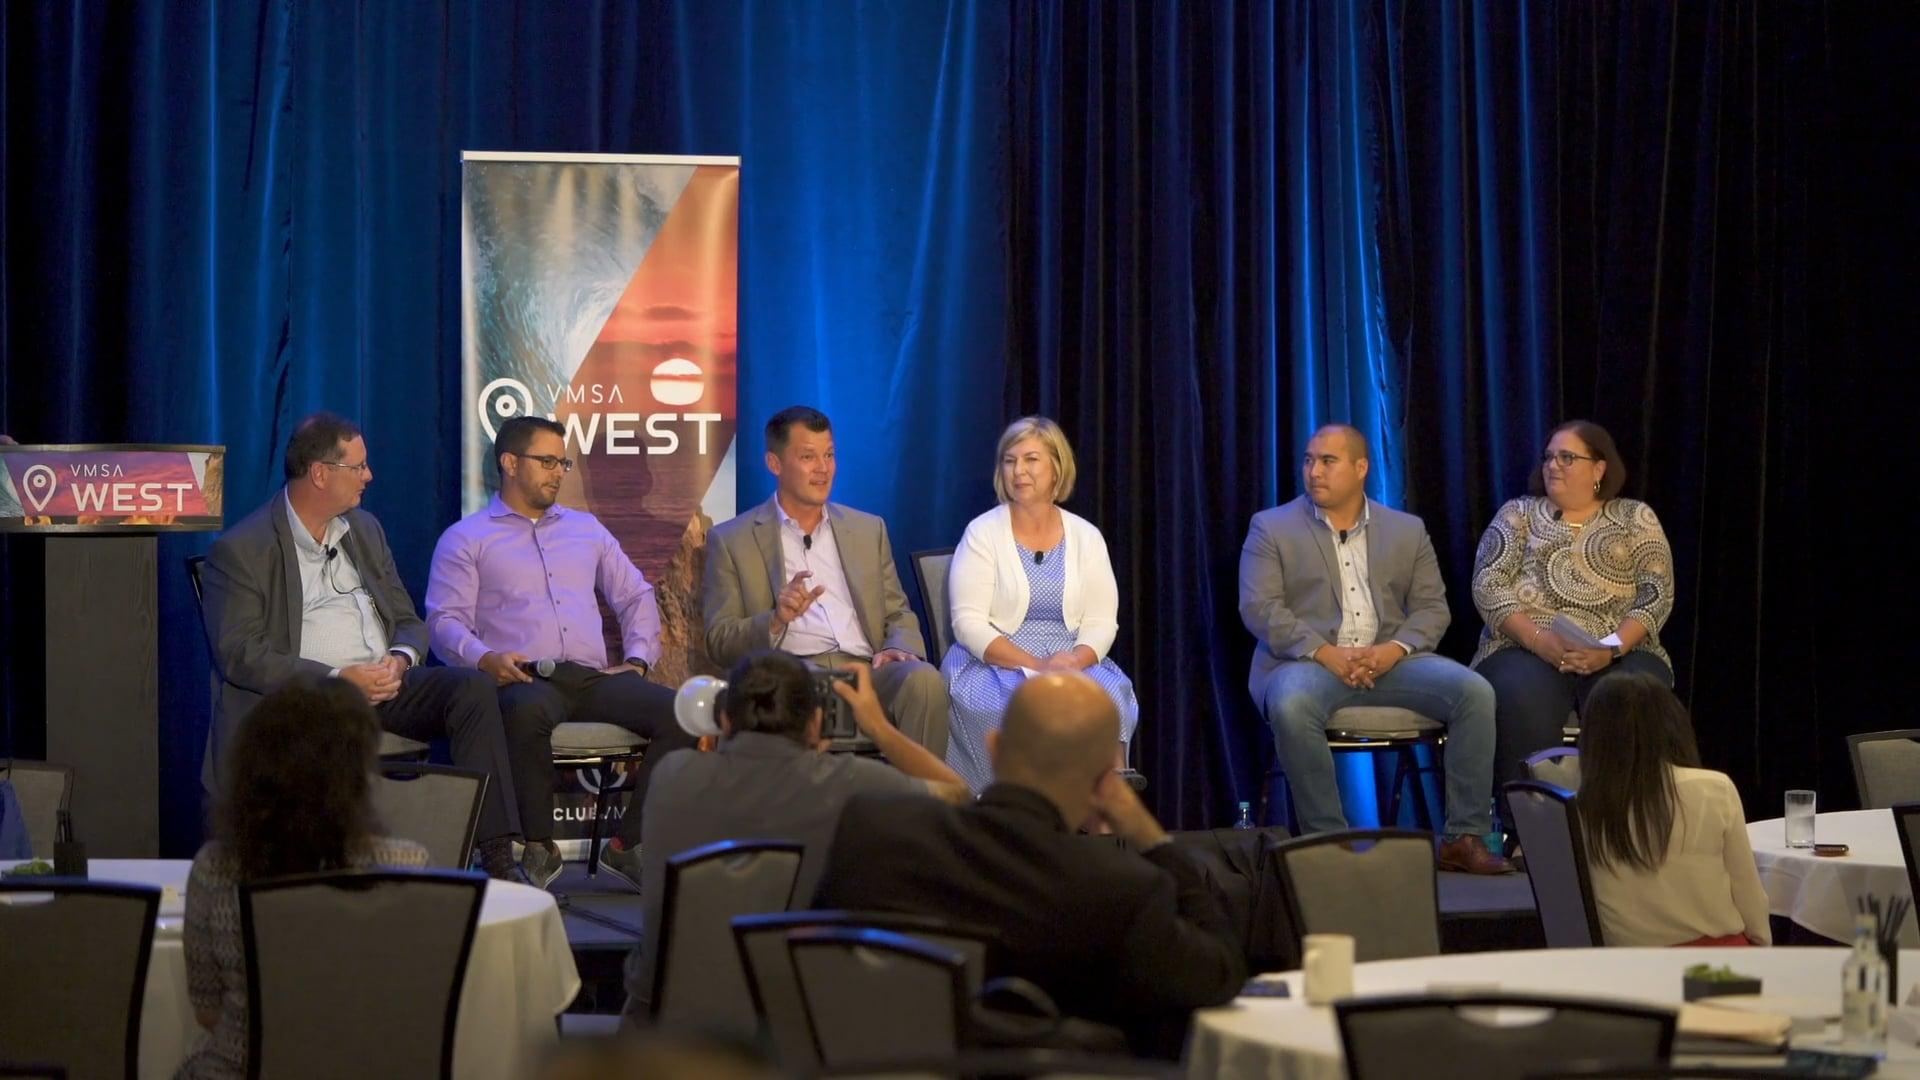 VMSA West Event Highlight